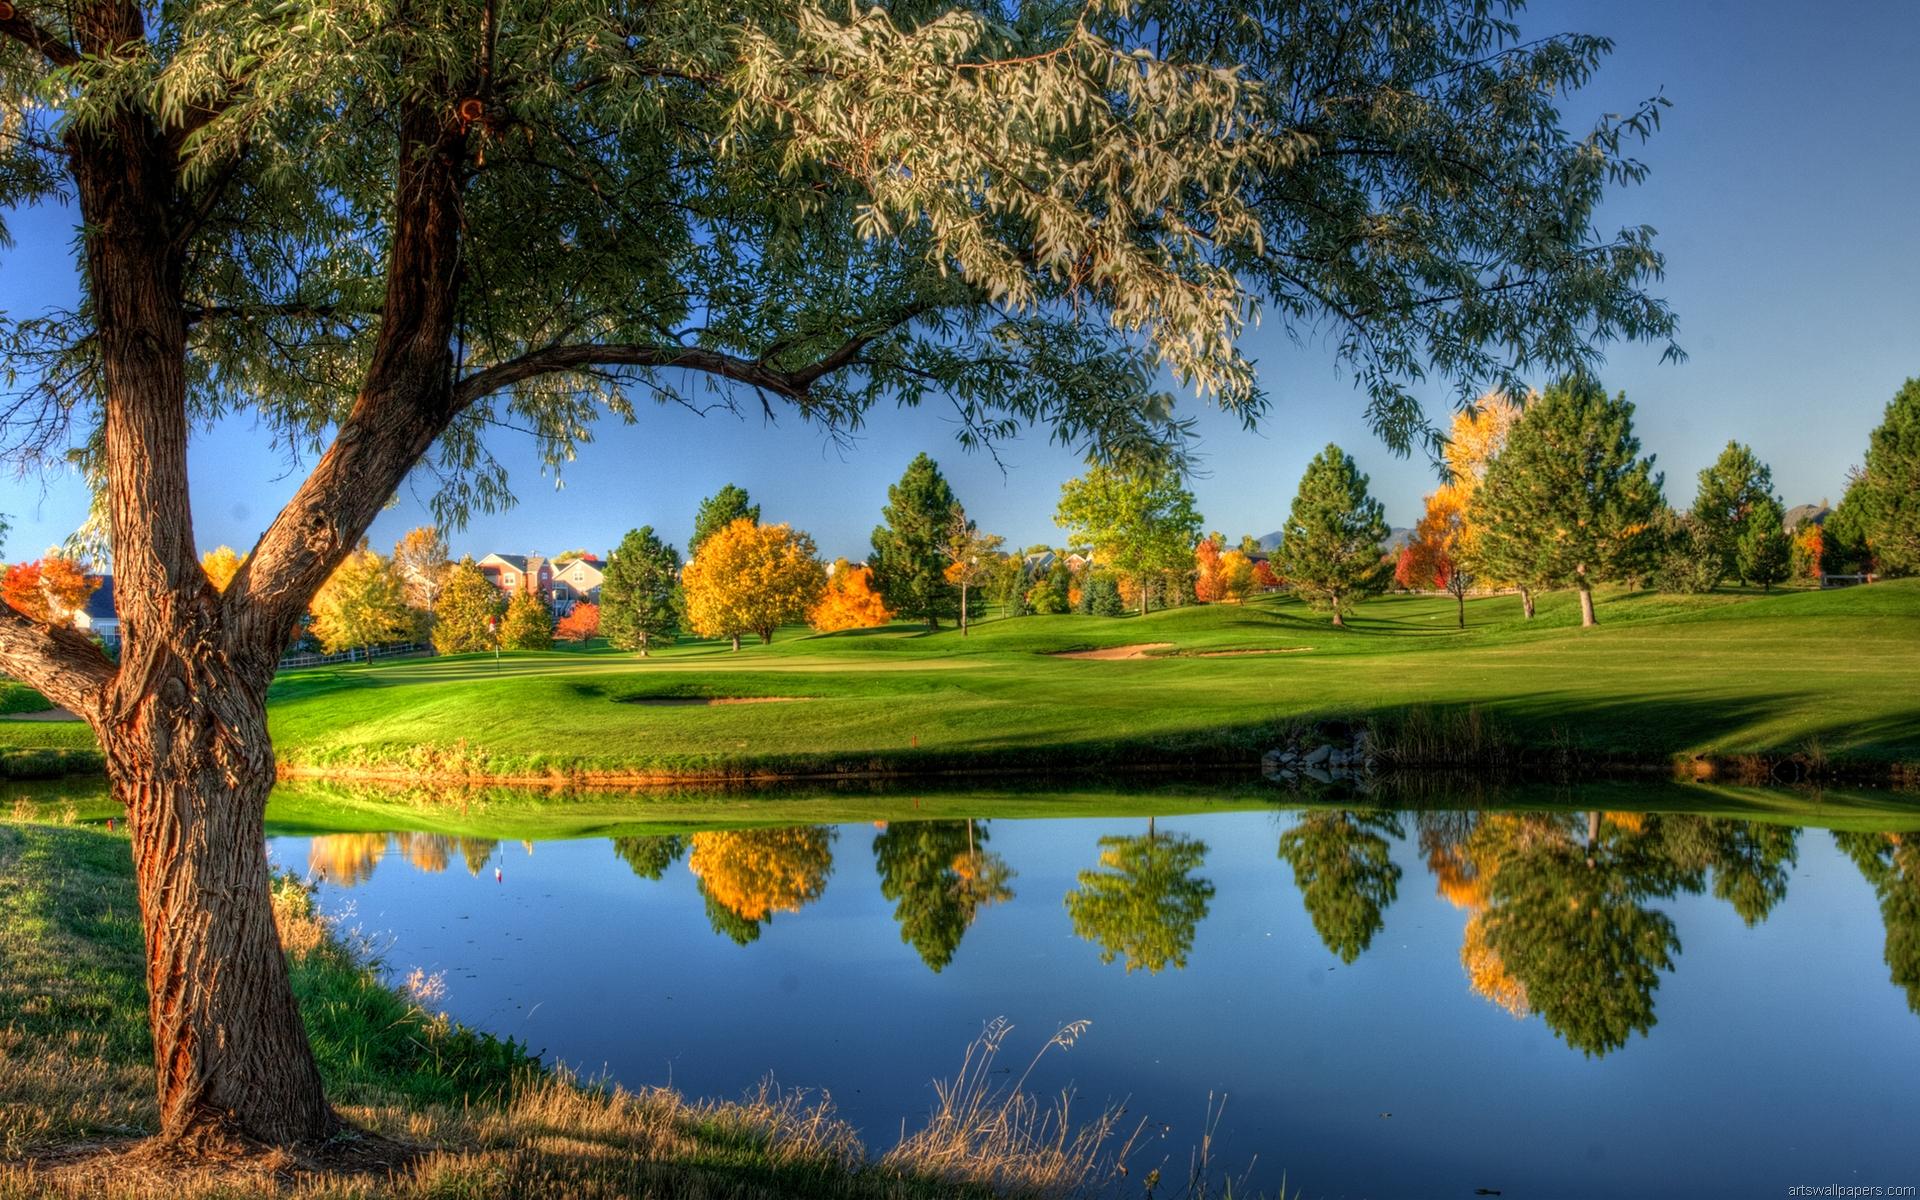 nature wallpaper hd for mobile,natural landscape,nature,sport venue,reflection,golf course